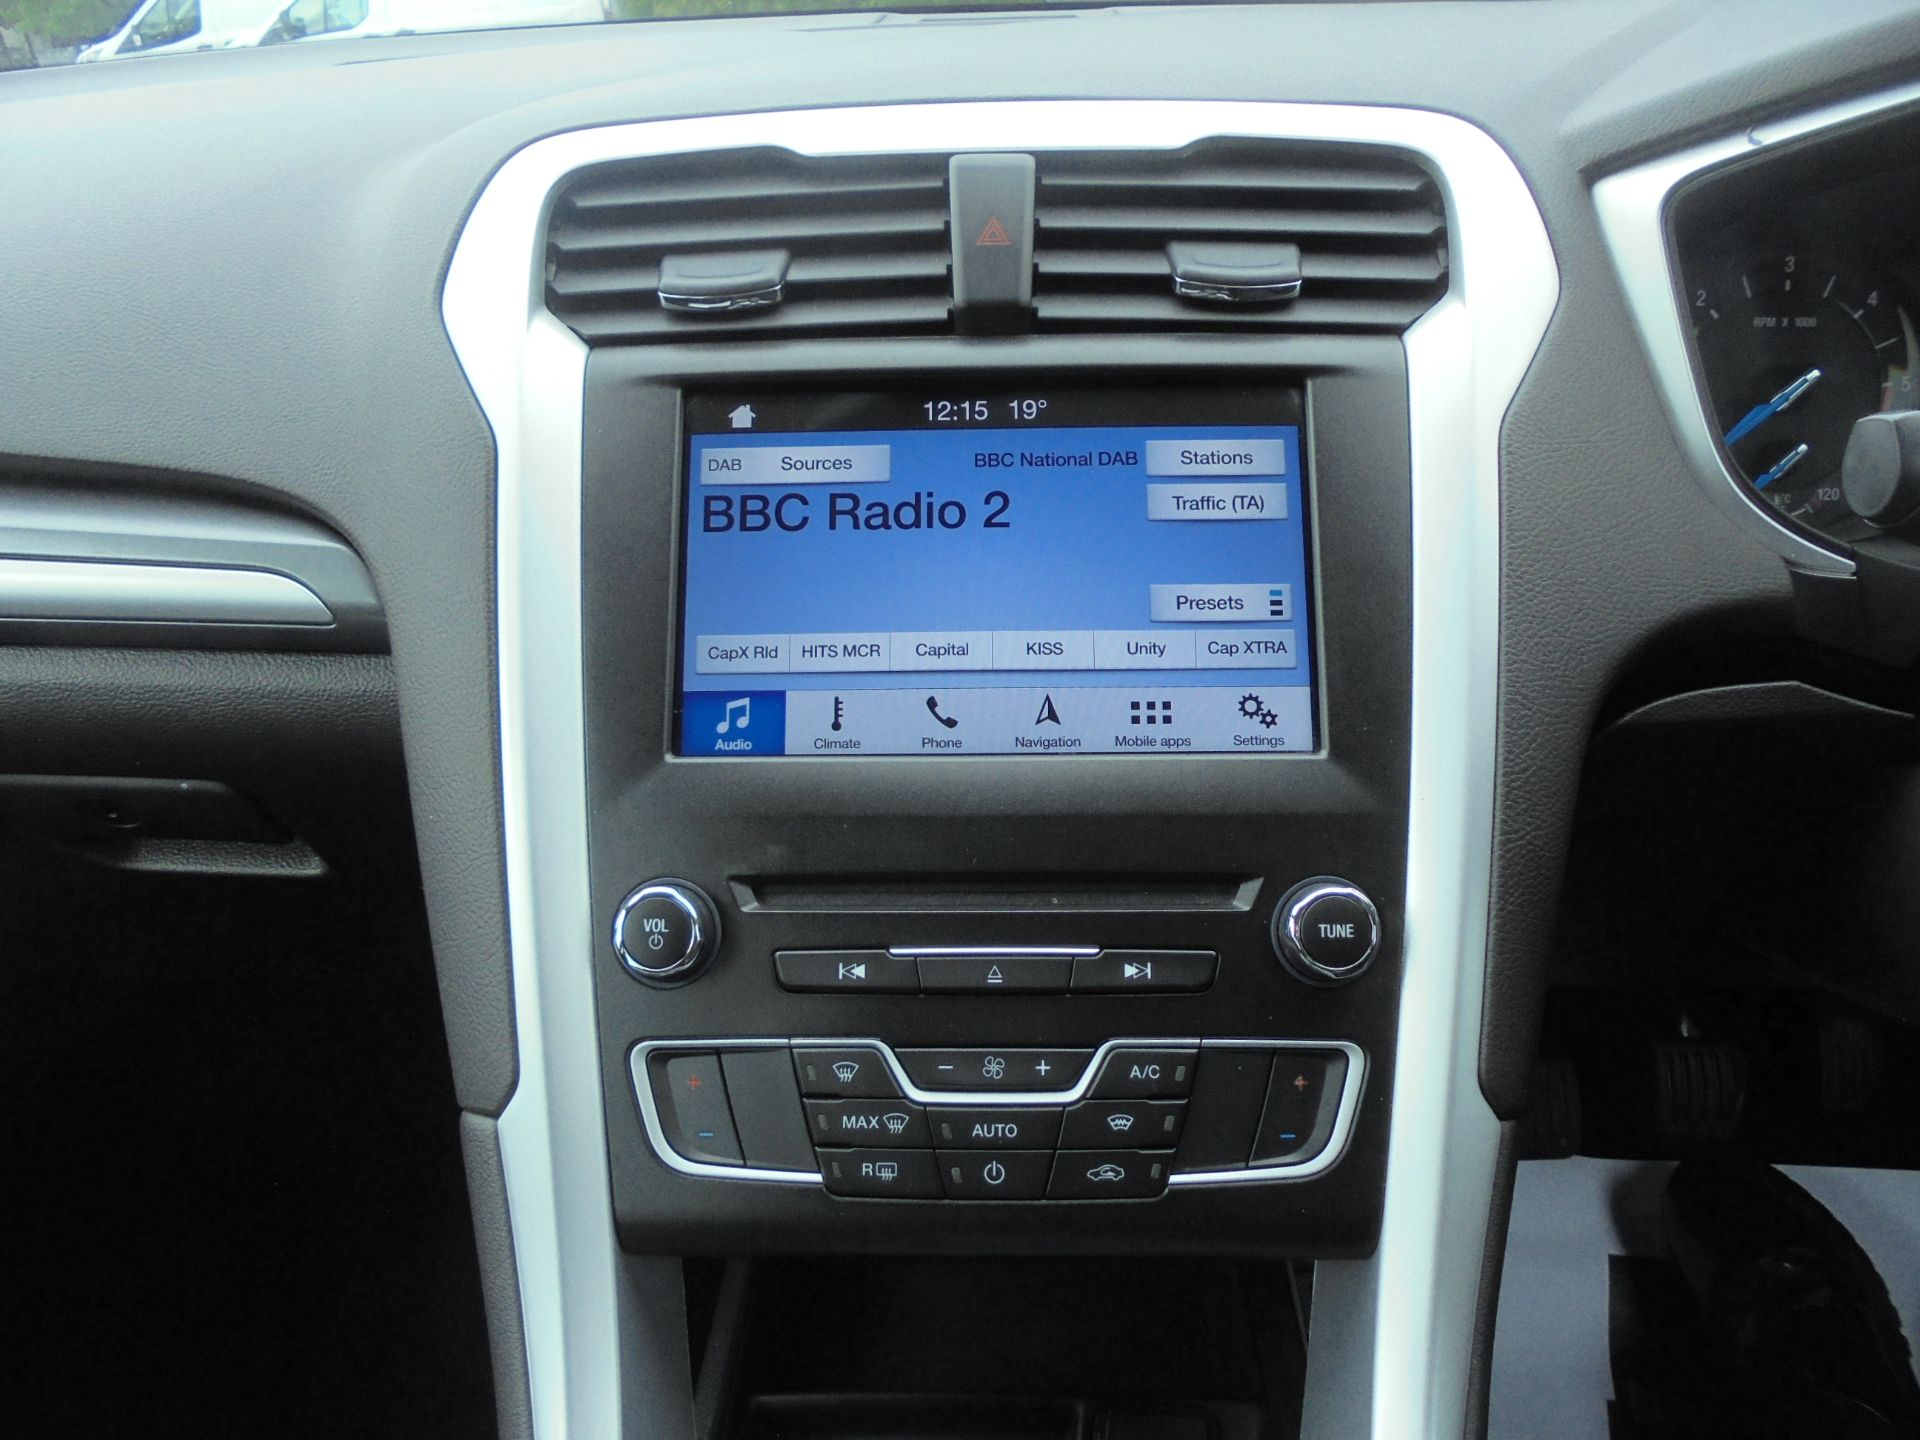 2017 Ford Mondeo 2.0 Tdci Econetic Zetec 5Dr [Nav] (WM17RHO) Image 14